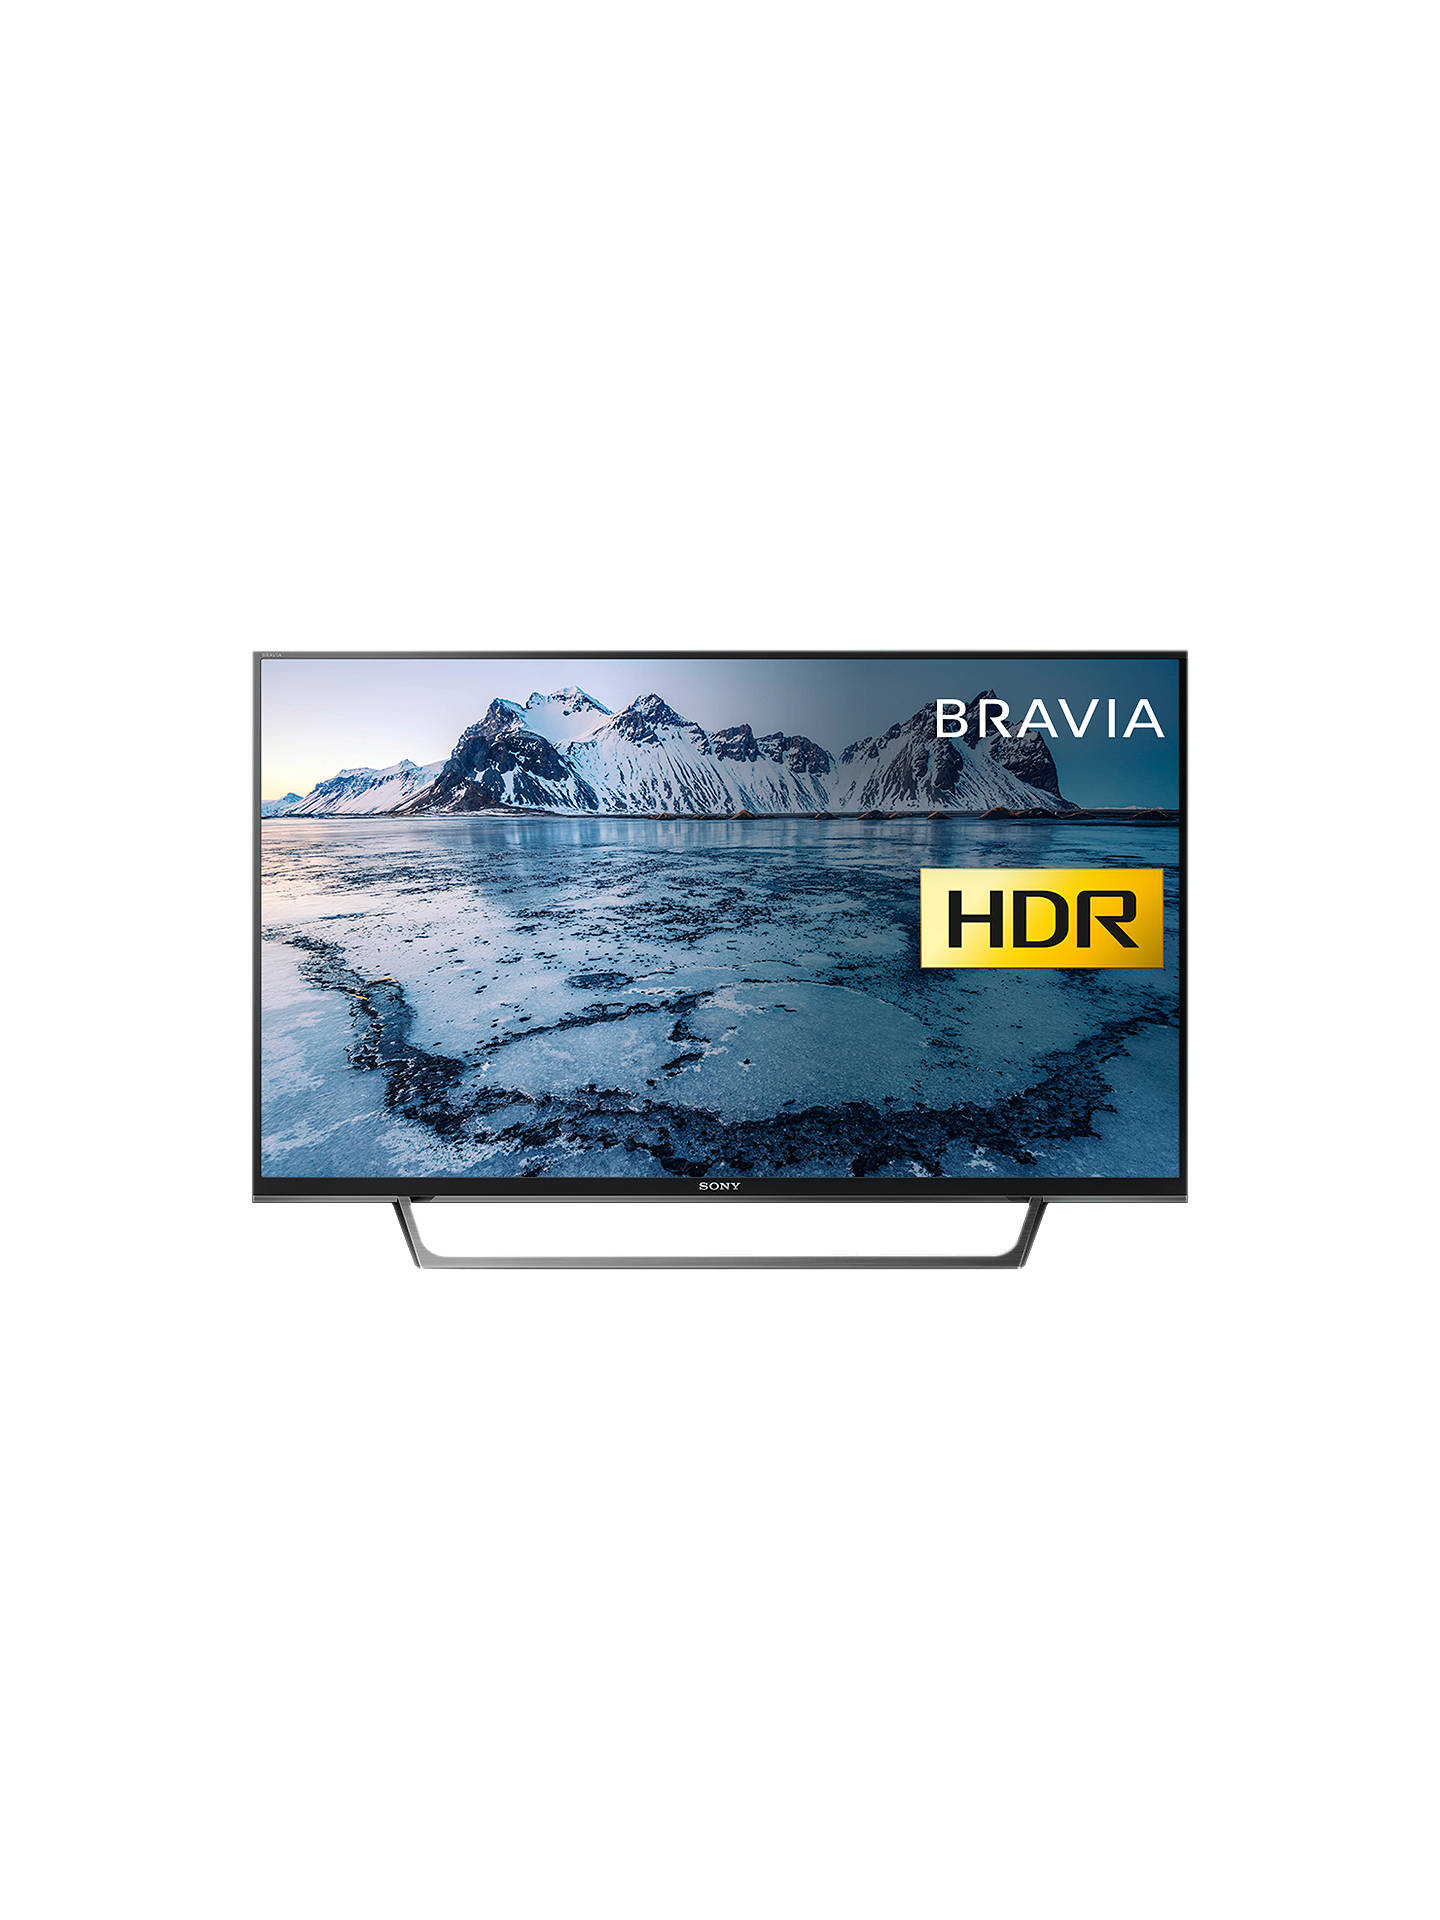 Sony Bravia KDL40WE663 LED HDR Full HD 1080p Smart TV, 40\